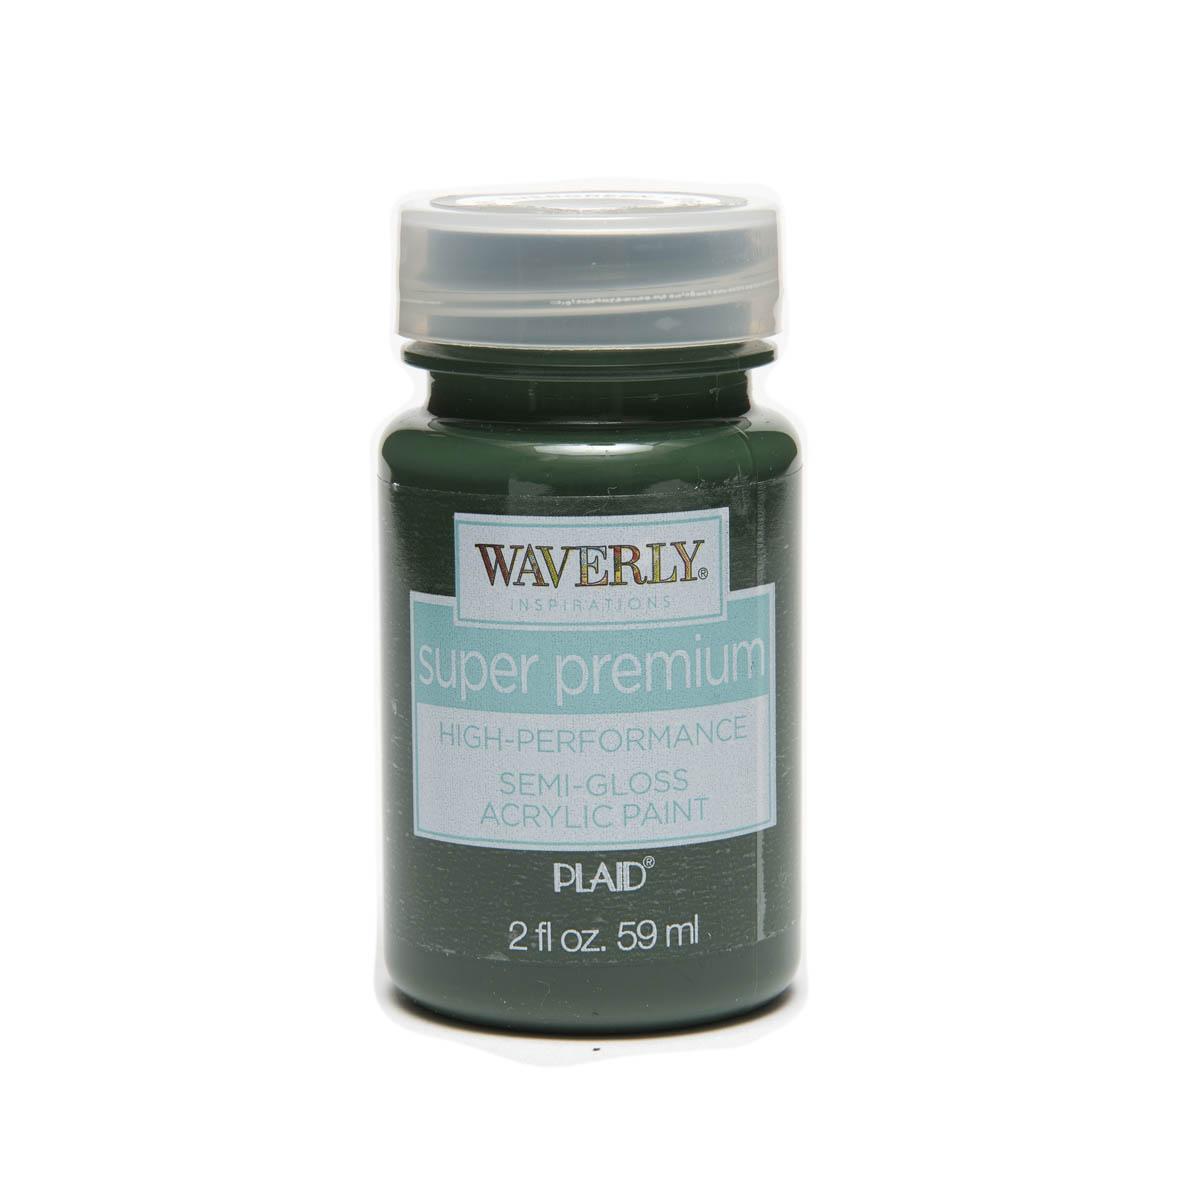 Waverly ® Inspirations Super Premium Semi-Gloss Acrylic Paint - Evergreen, 2 oz.